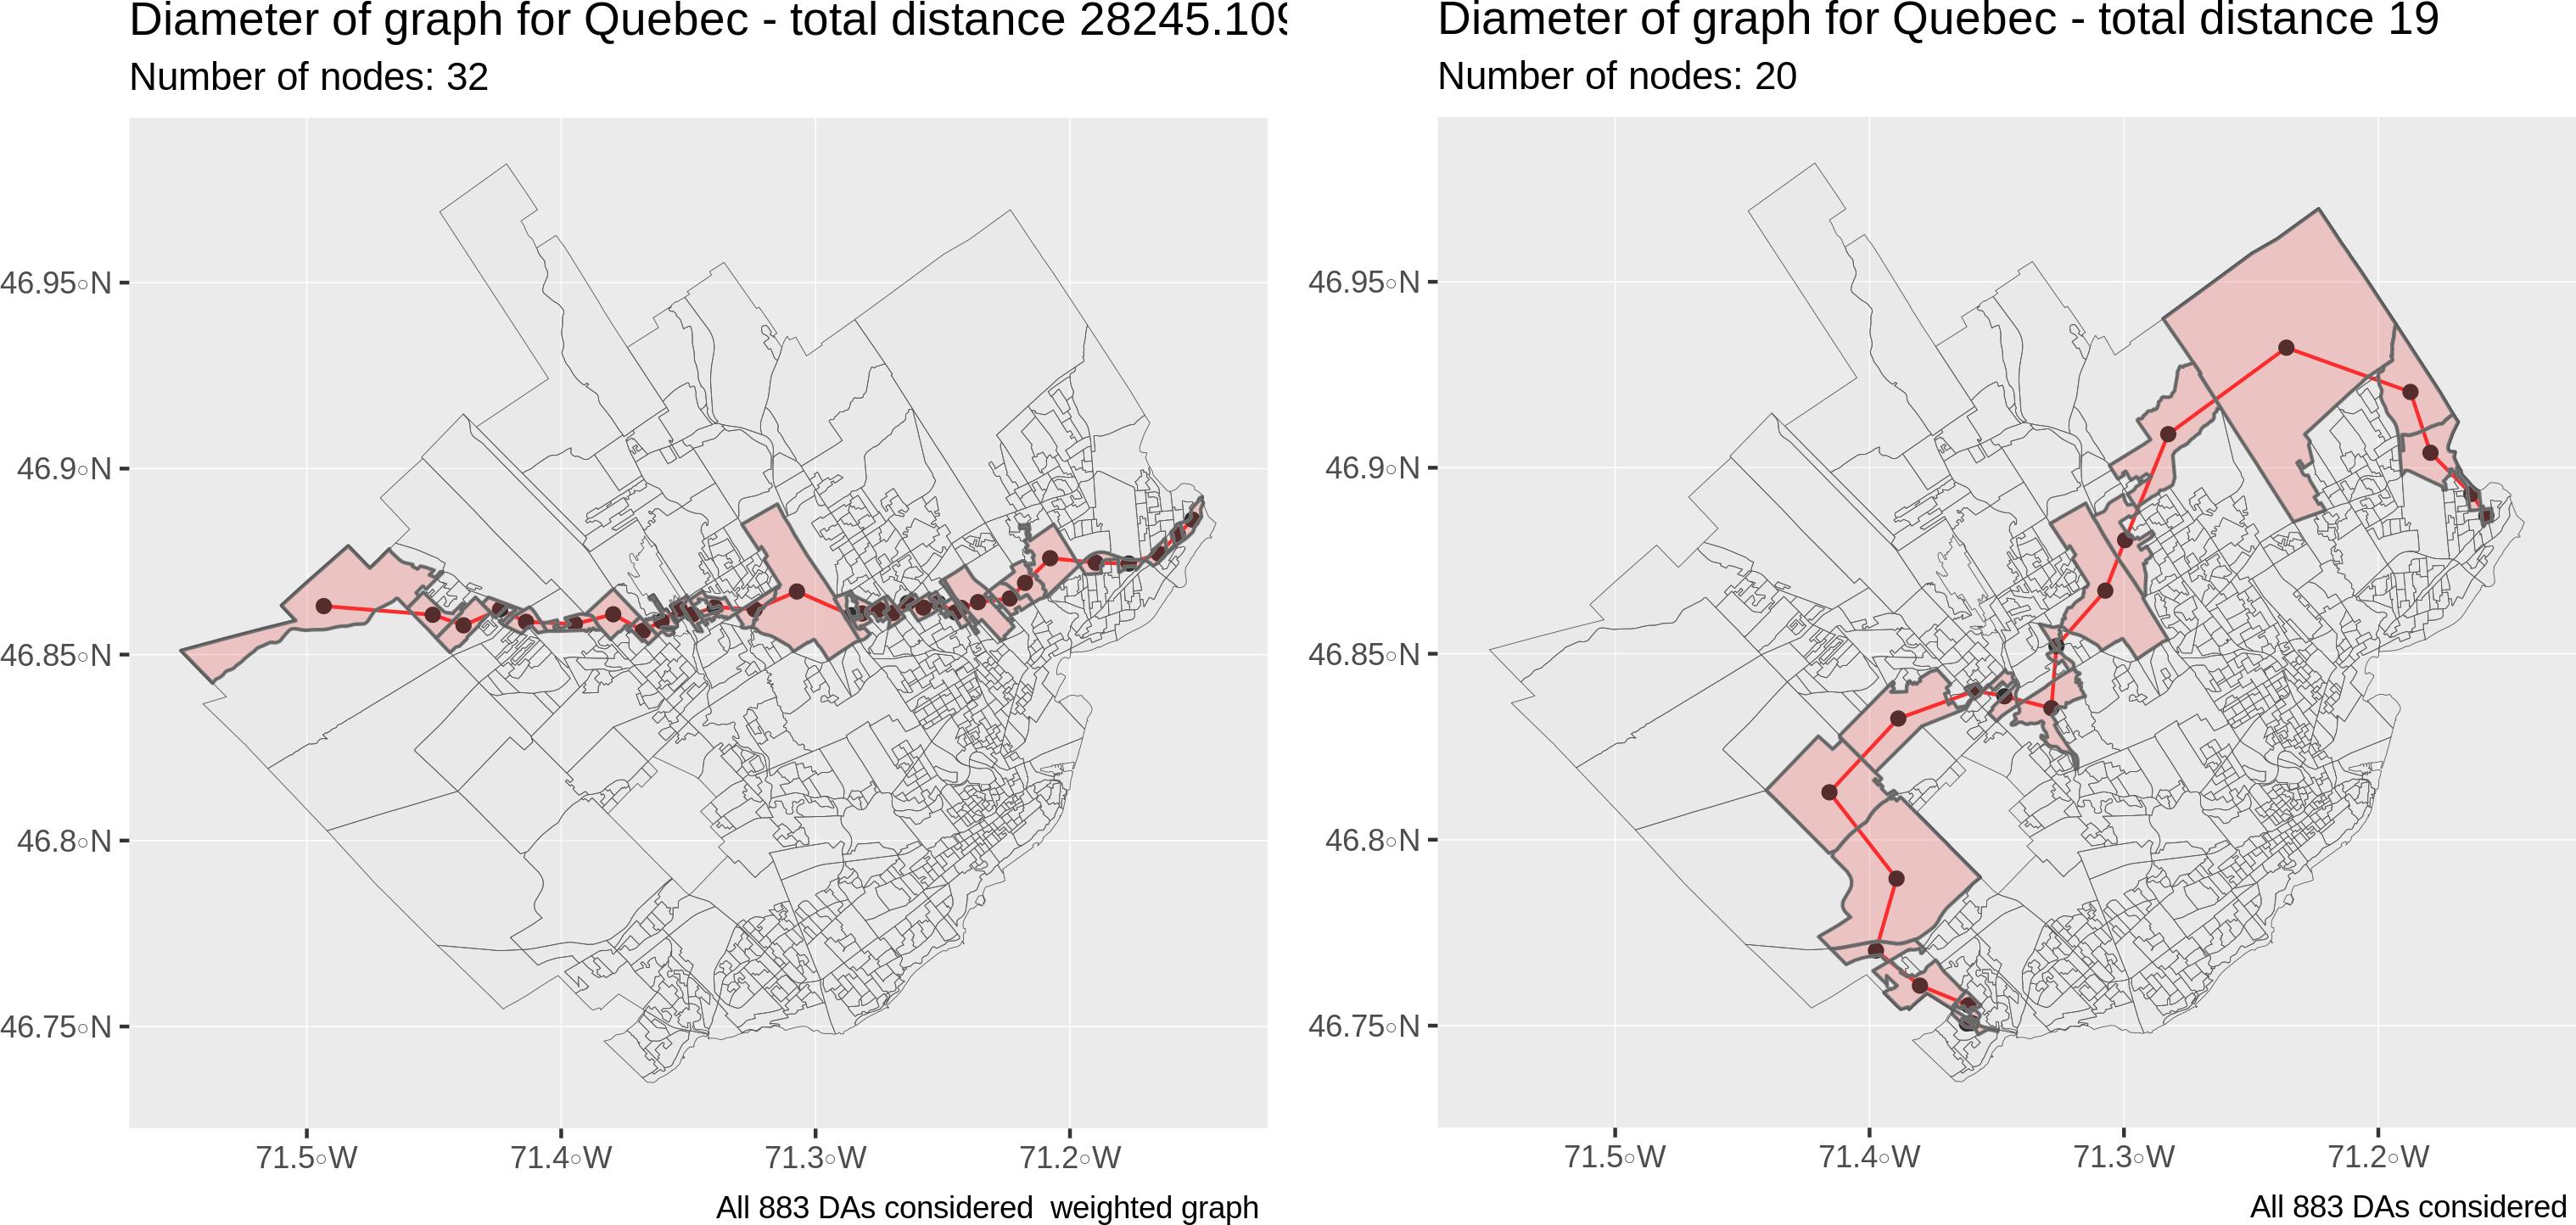 Quebec diameter - DAs - weighted graph - as-the-crow-flies